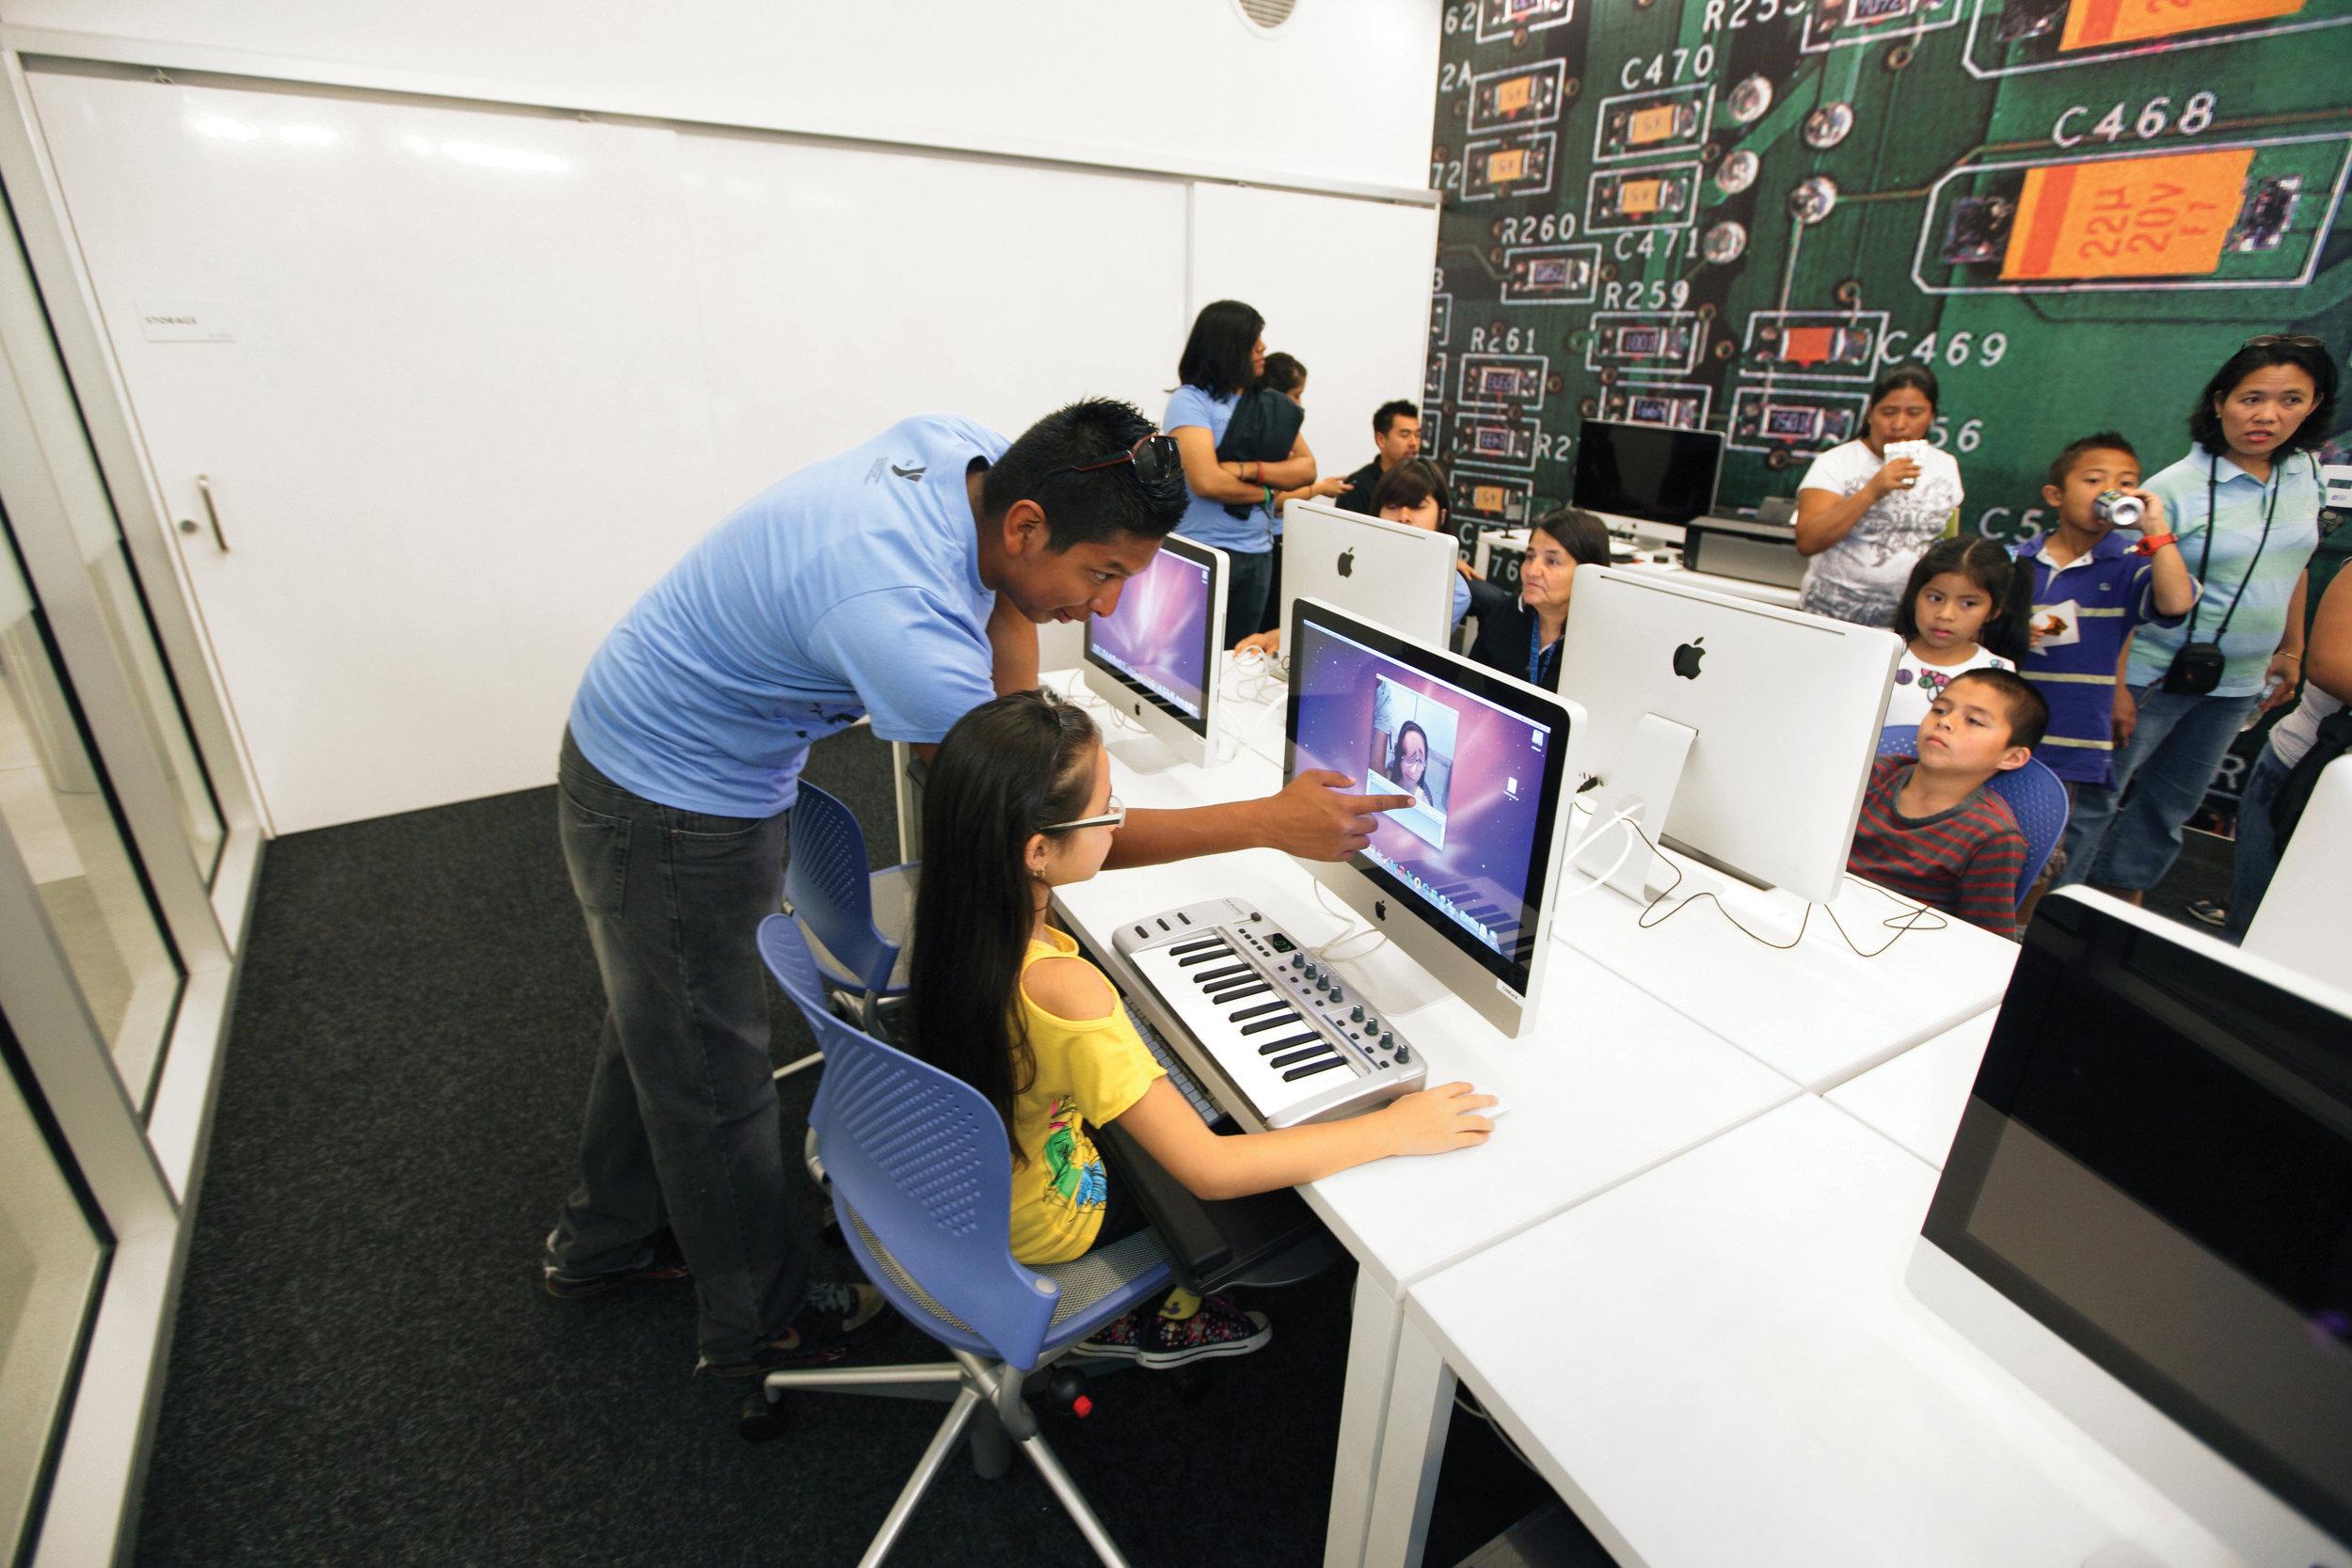 Otis Booth Campus - Computer Lab - CII.jpg